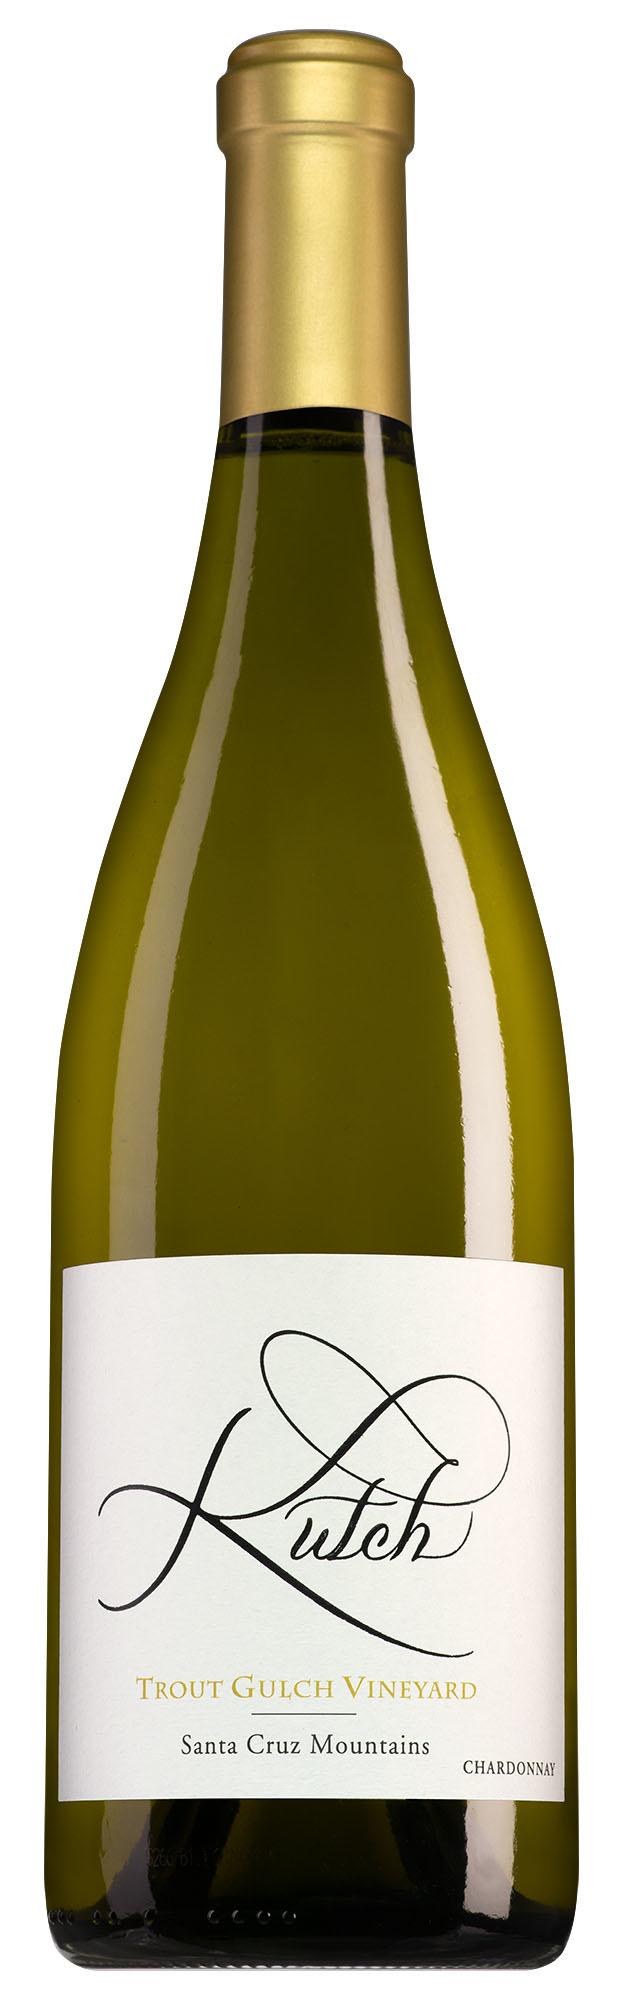 Kutch Santa Cruz Mountains Trout Gulch Chardonnay 2019